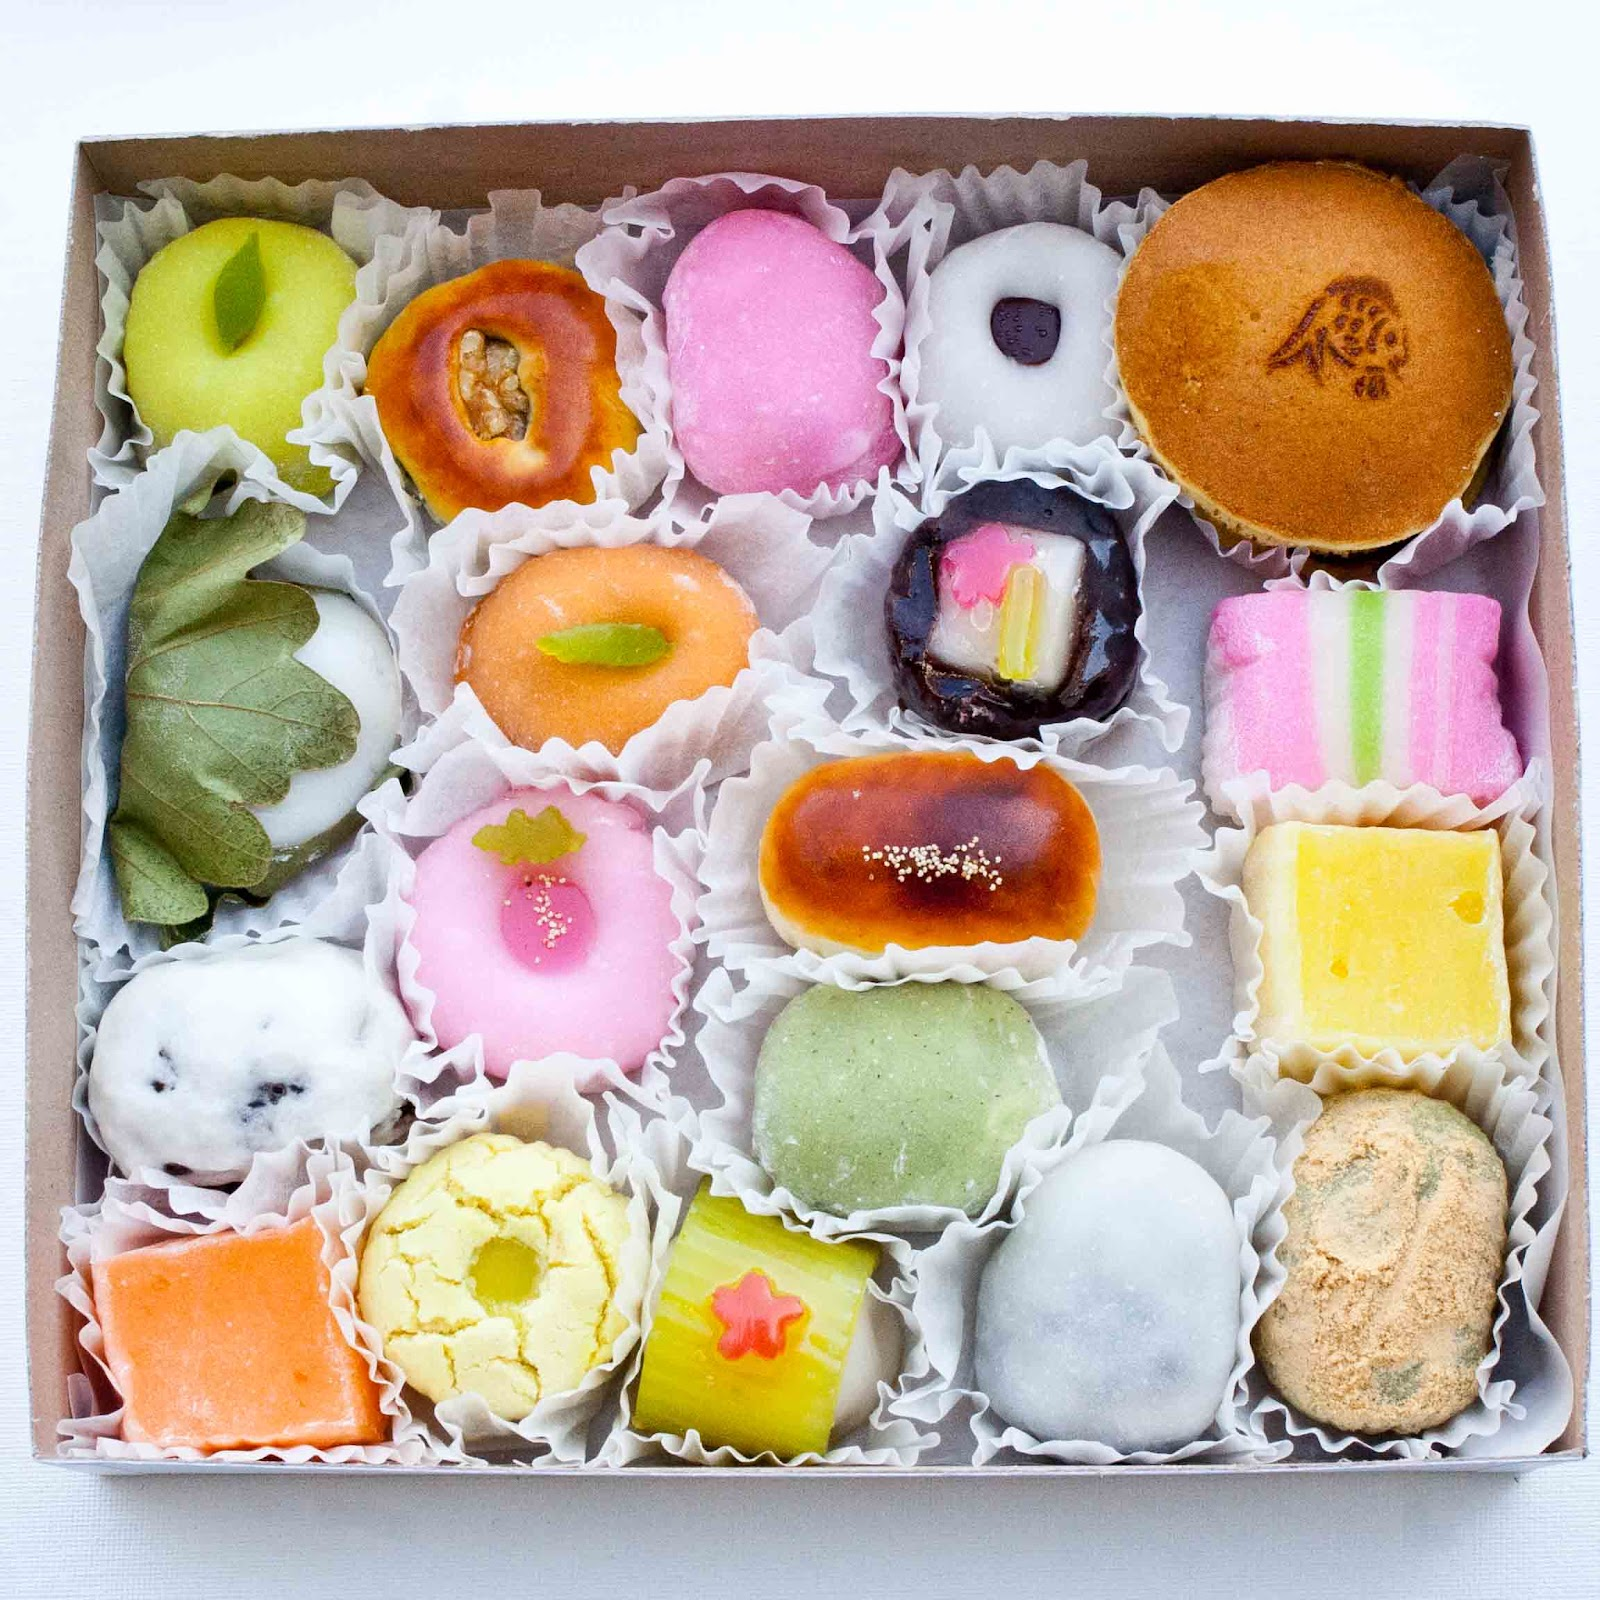 FOODjimoto: Fugetsu-Do Japanese Sweet Shop